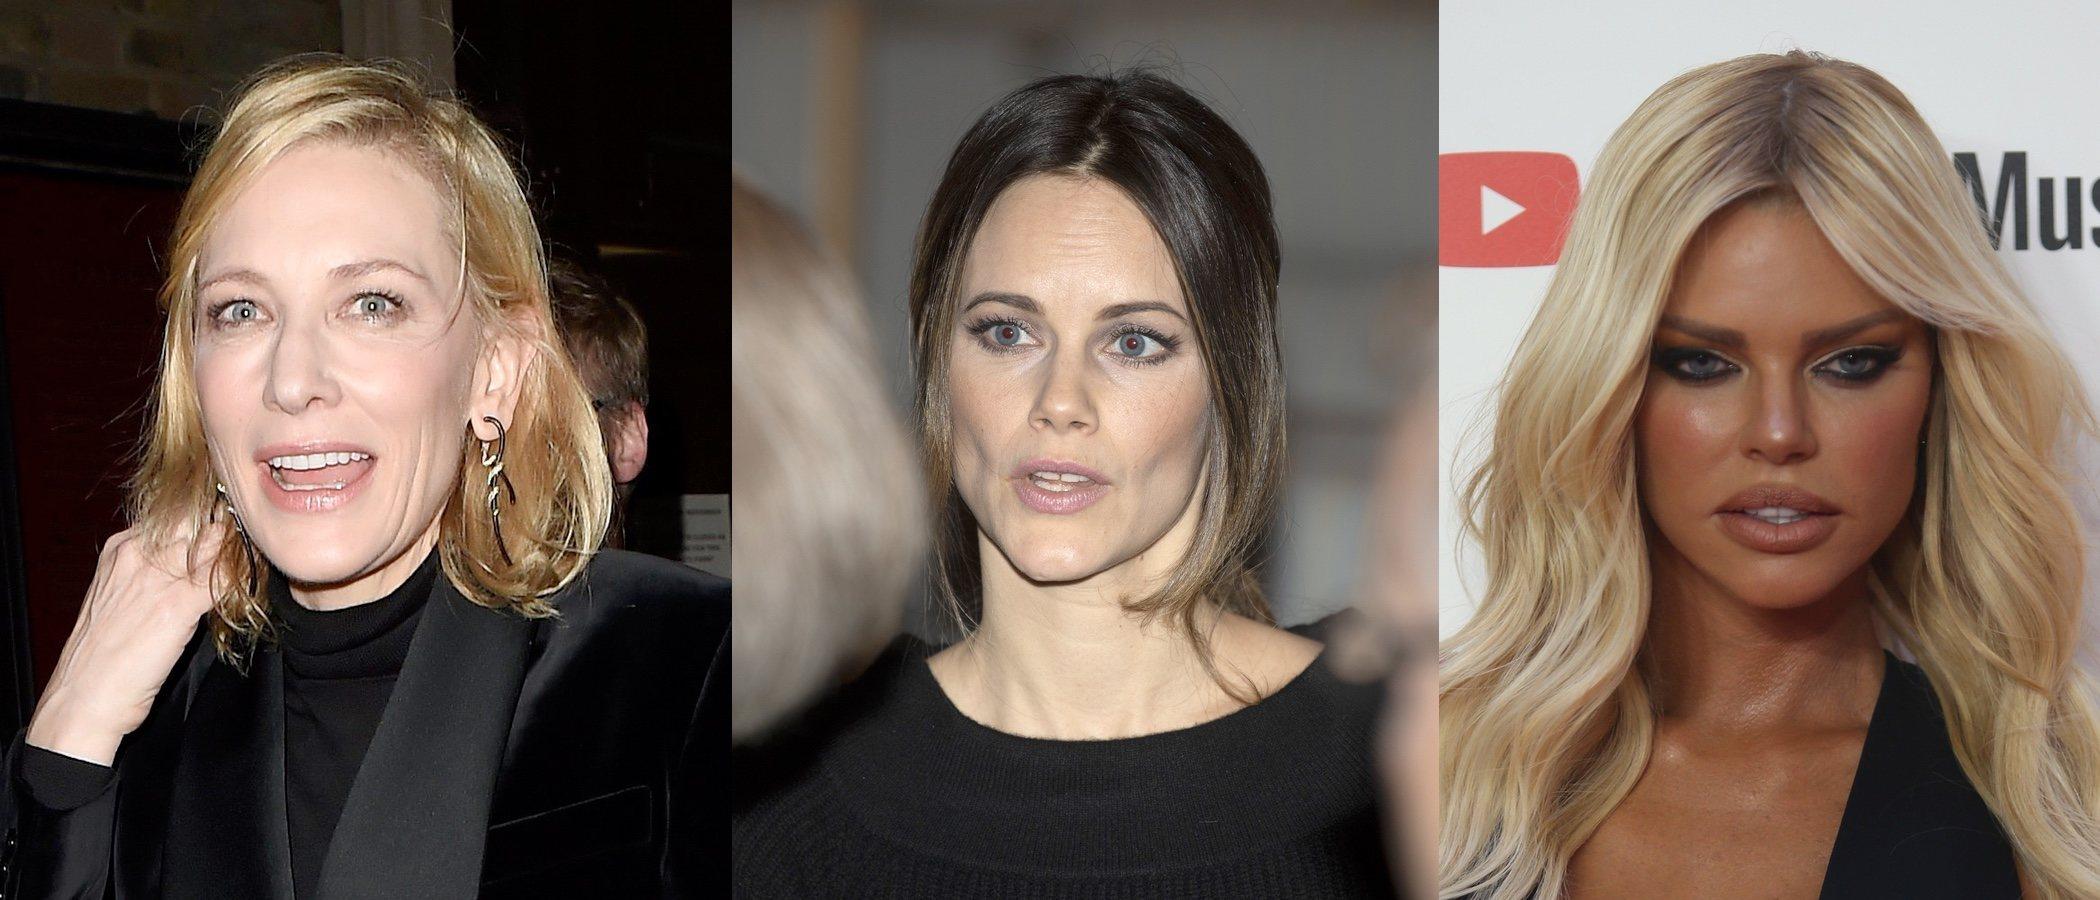 Cate Blanchett, Sofia Hellqvist y Sophie Monk lucen los peores beauty looks de la semana